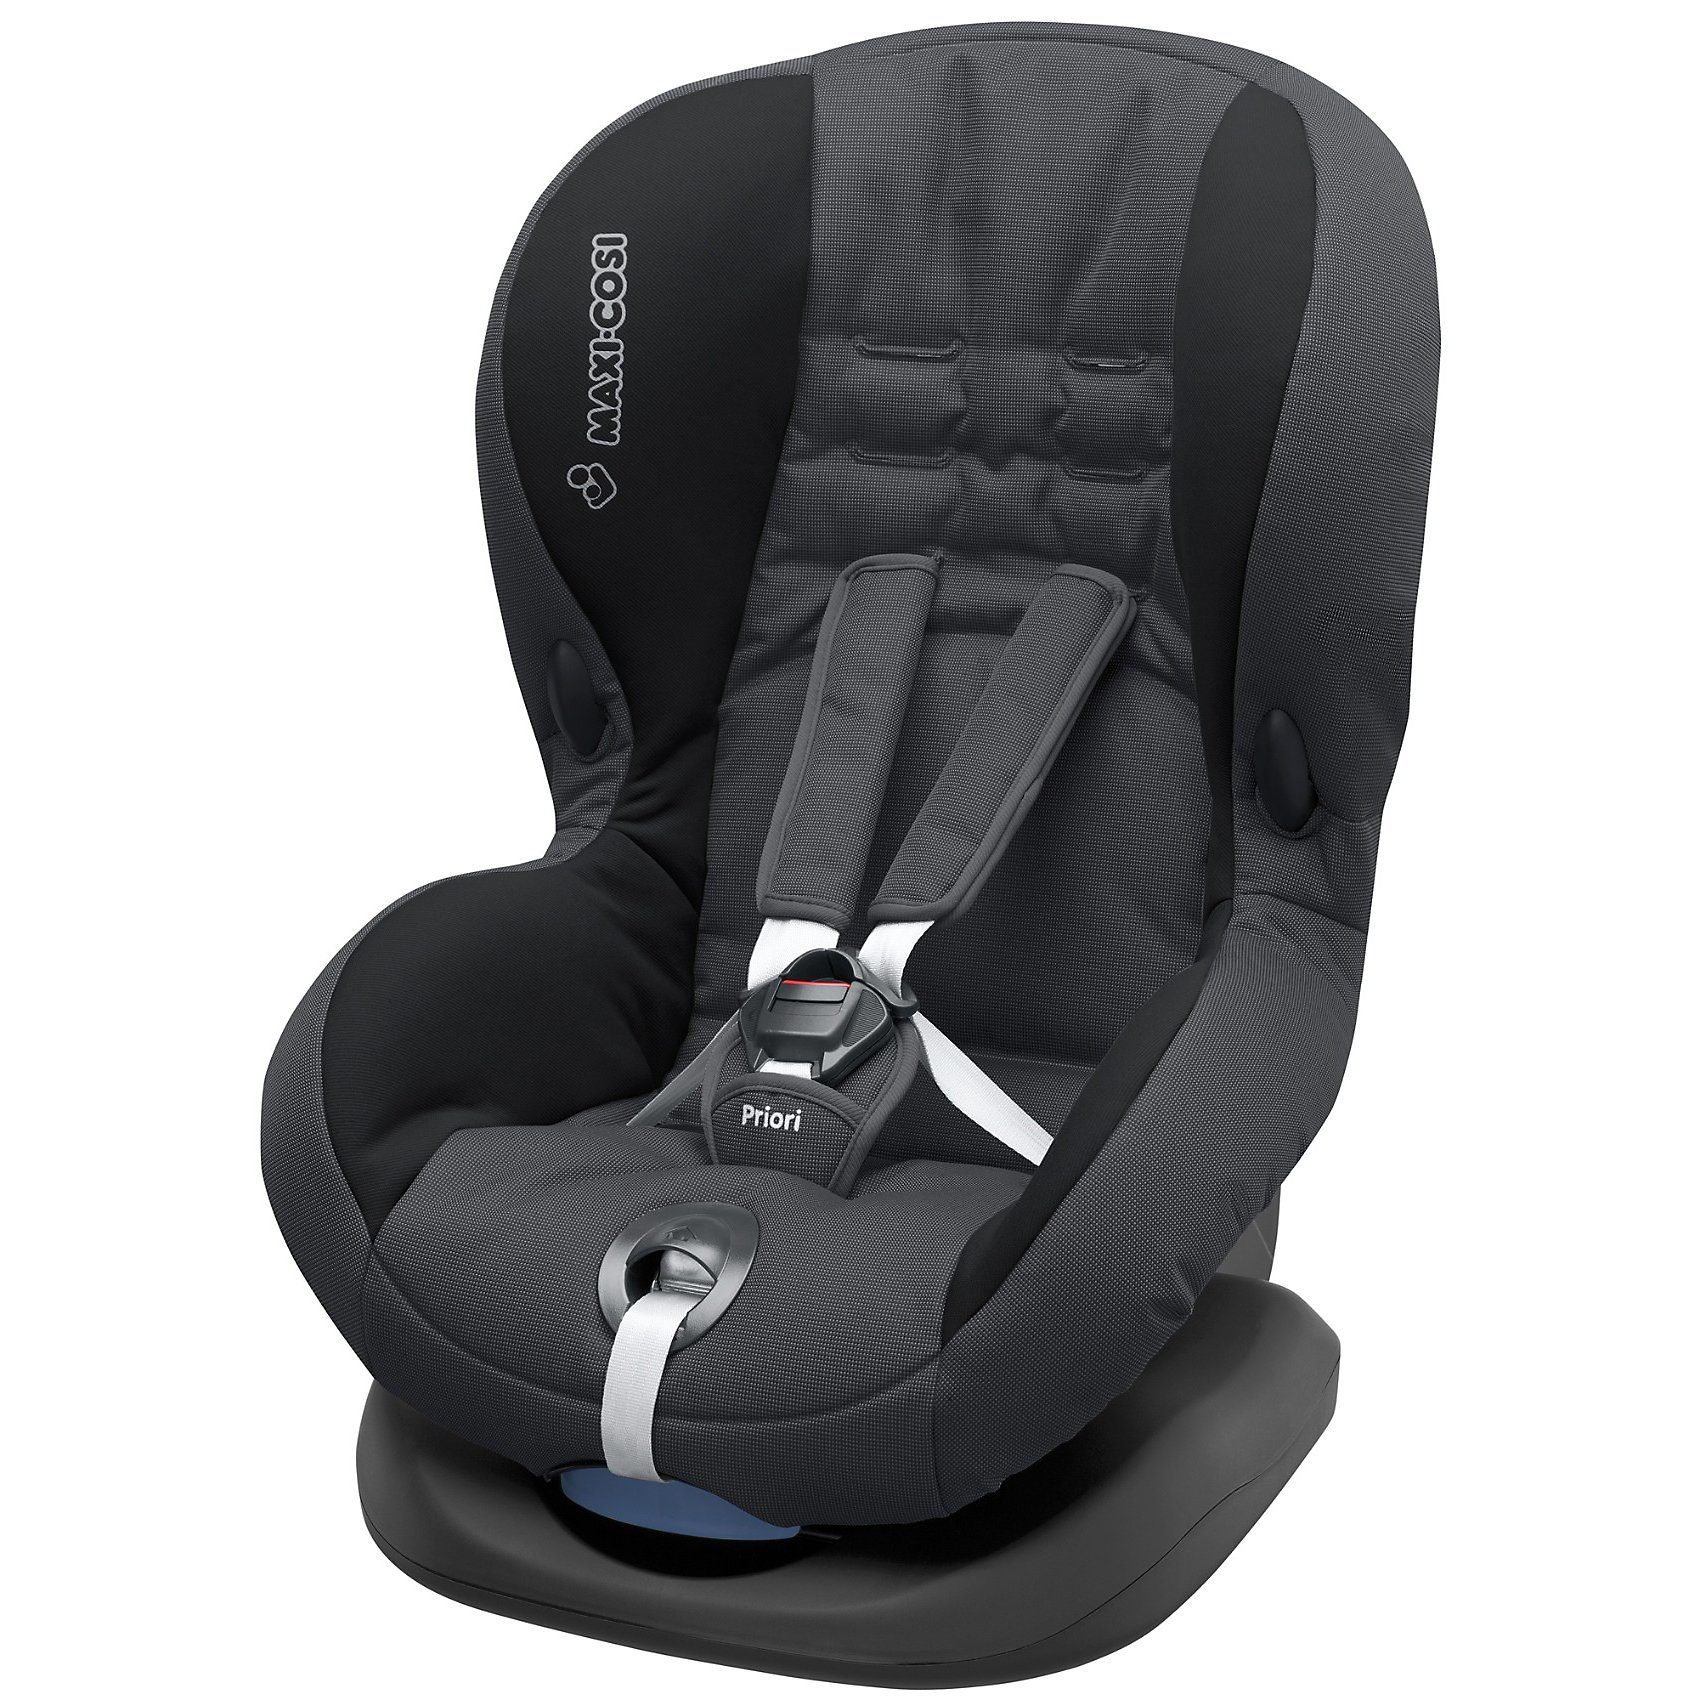 Maxi-Cosi Auto-Kindersitz Priori SPS+, Stone, 2016